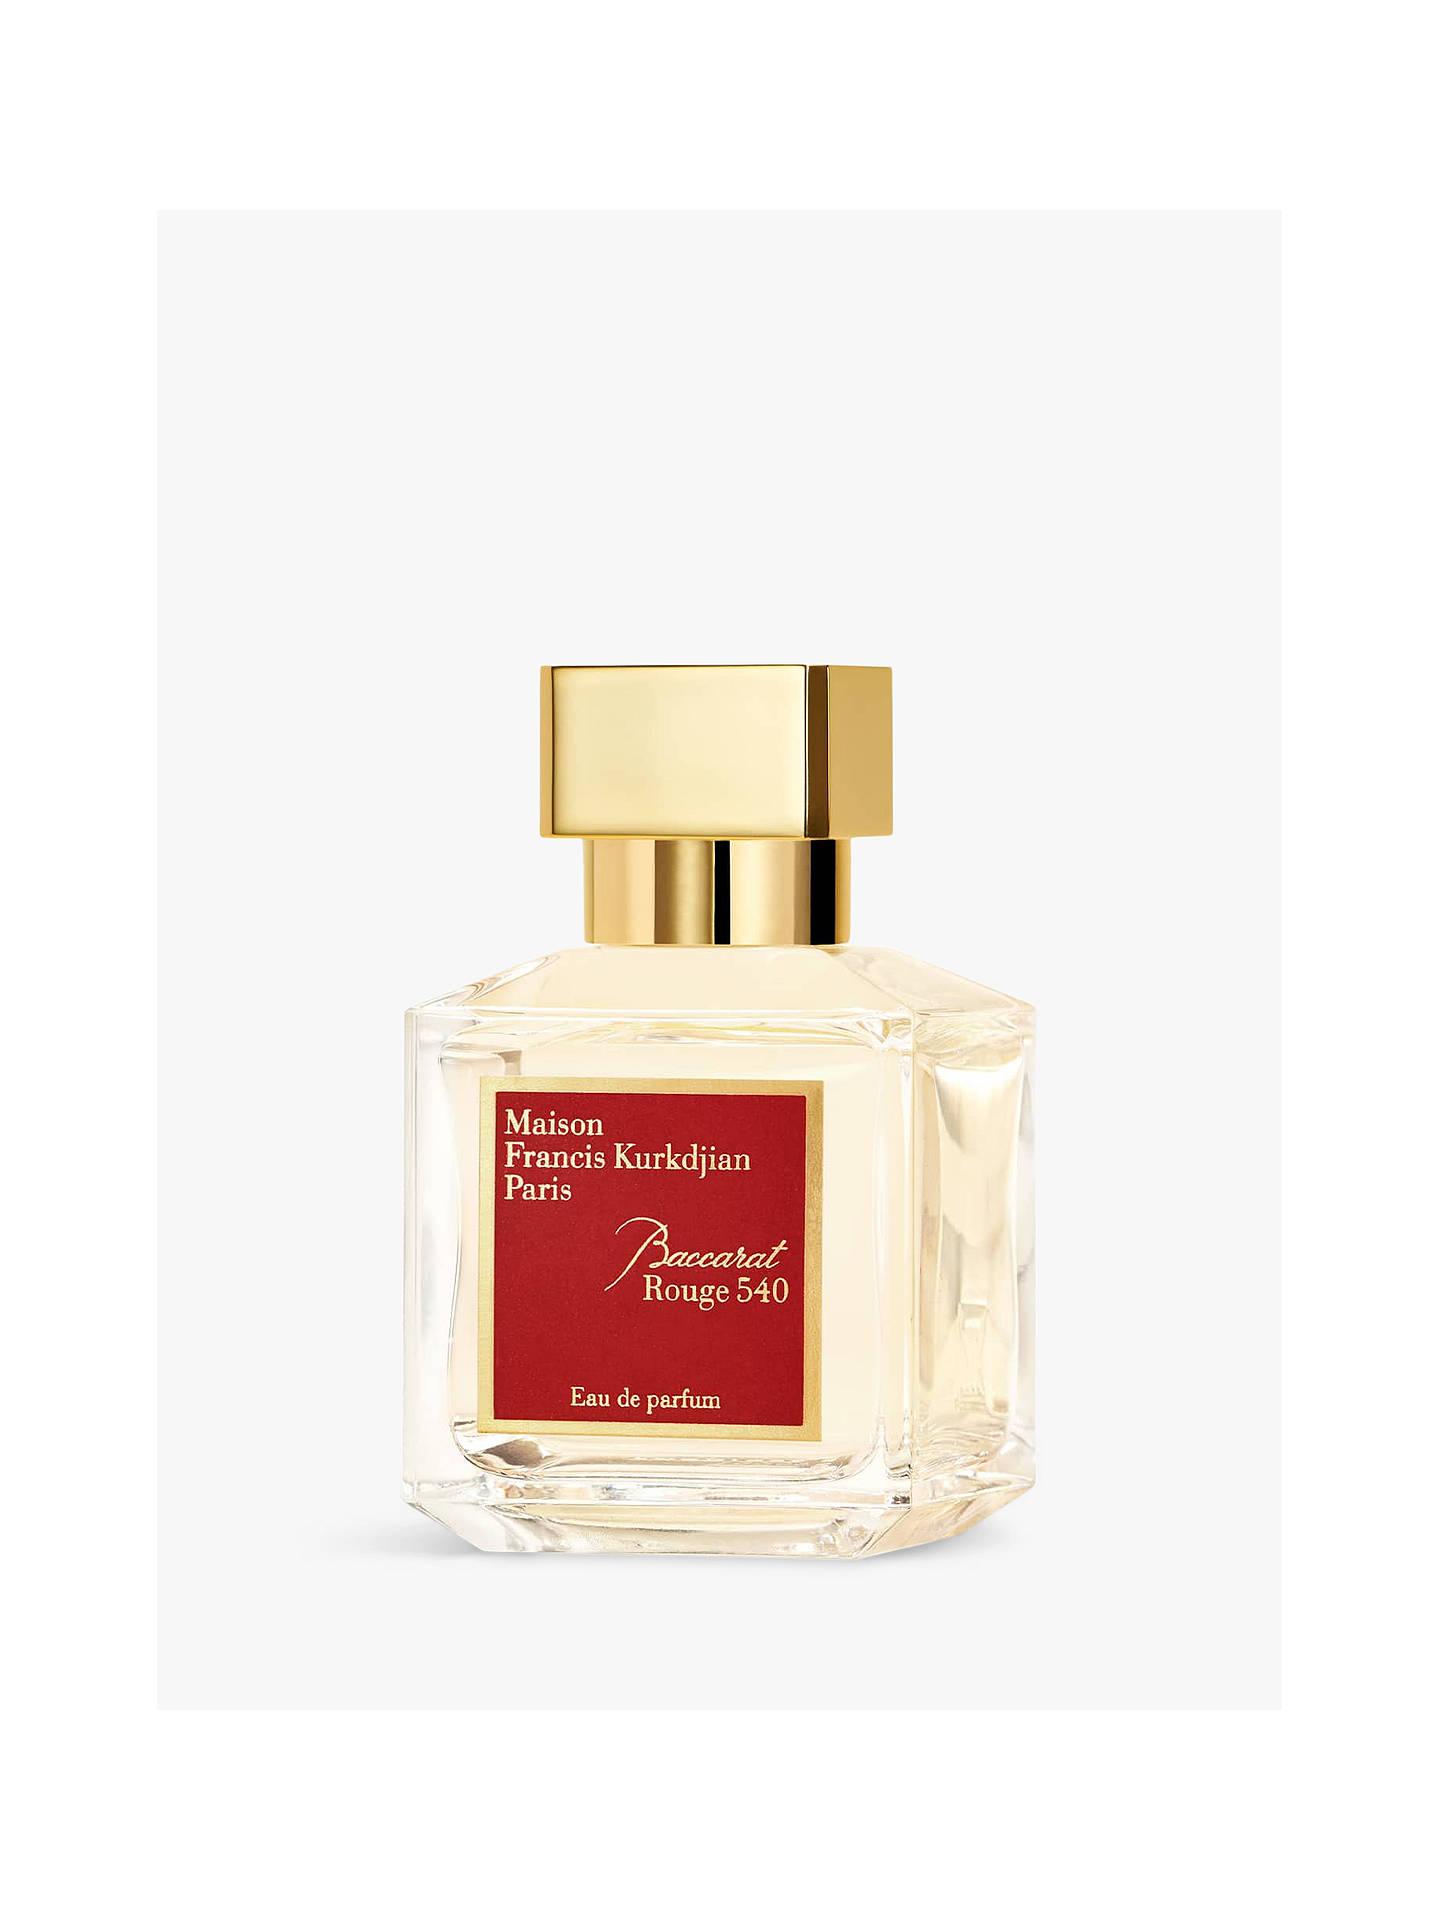 Maison Francis Kurkdjian Baccarat Rouge 540 Eau De Parfum 70ml At